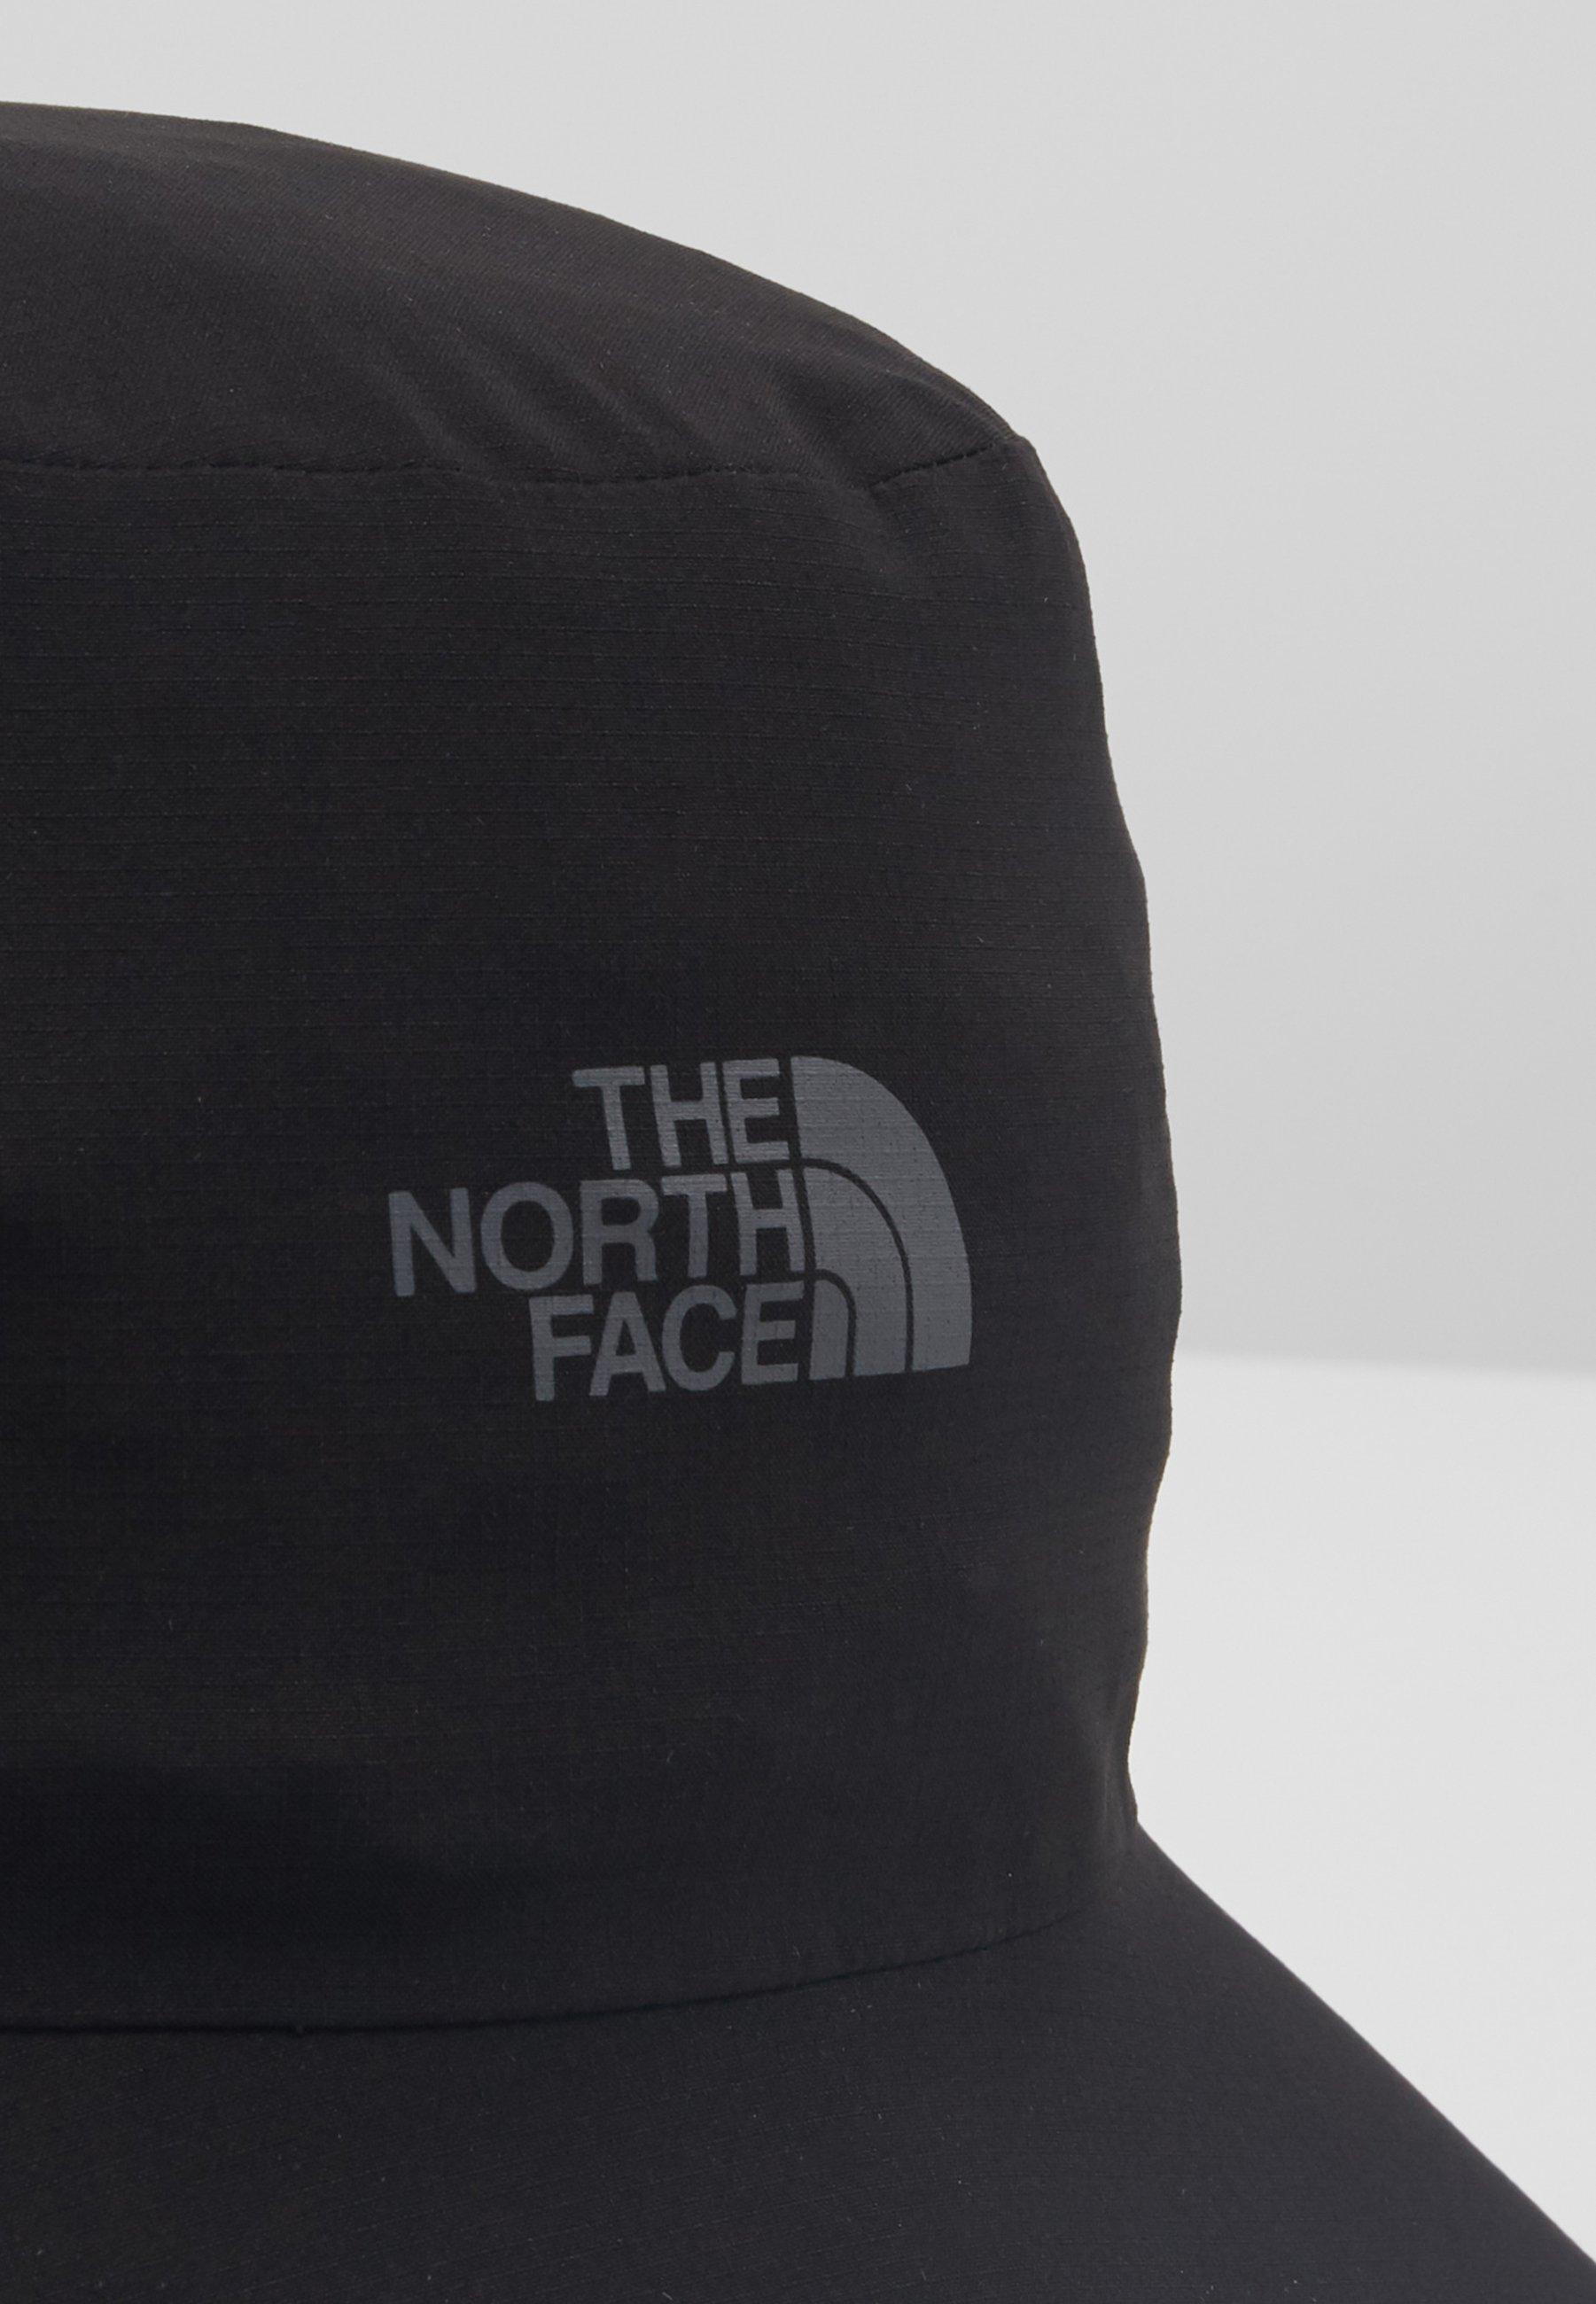 The North Face City Future - Hut Black/schwarz